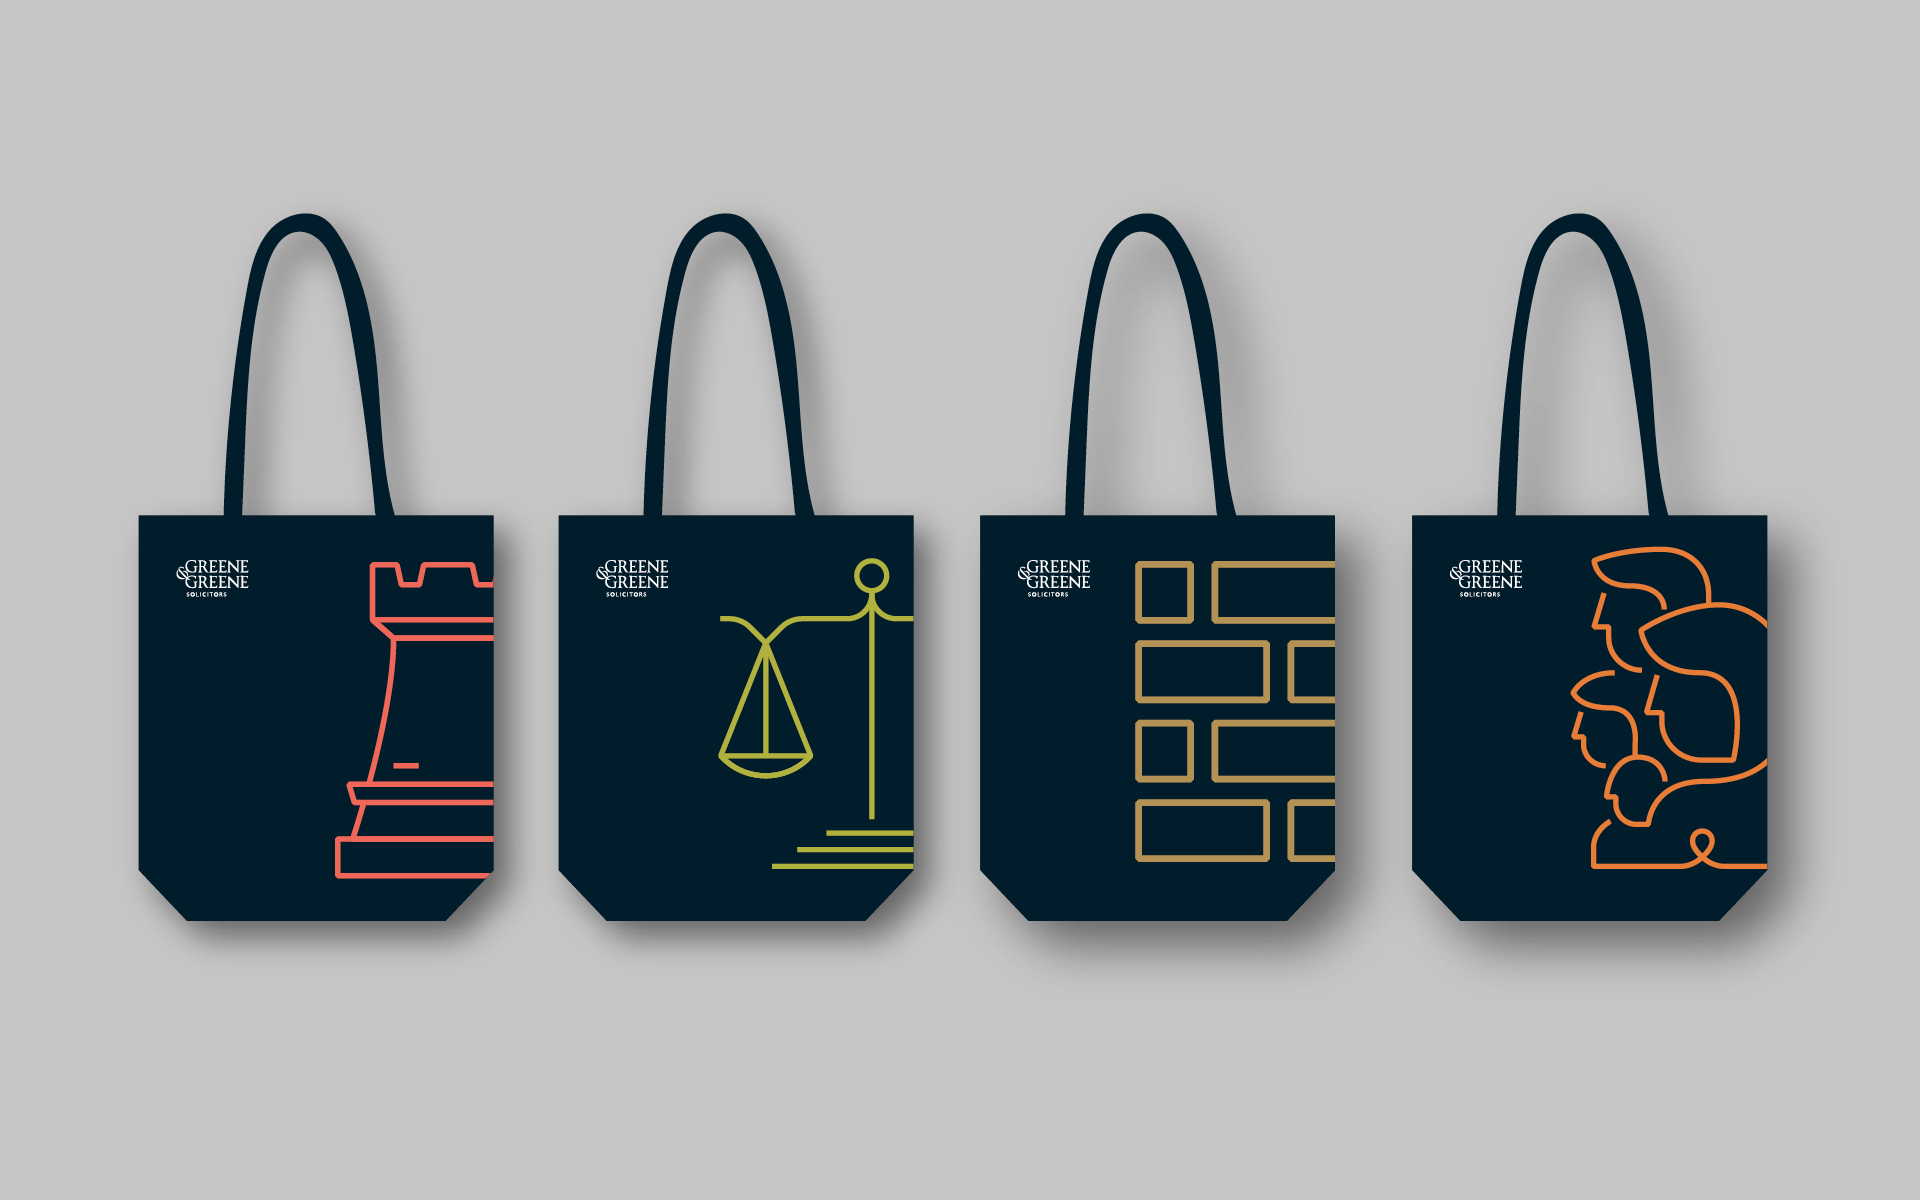 Tote bag design for Greene & Greene